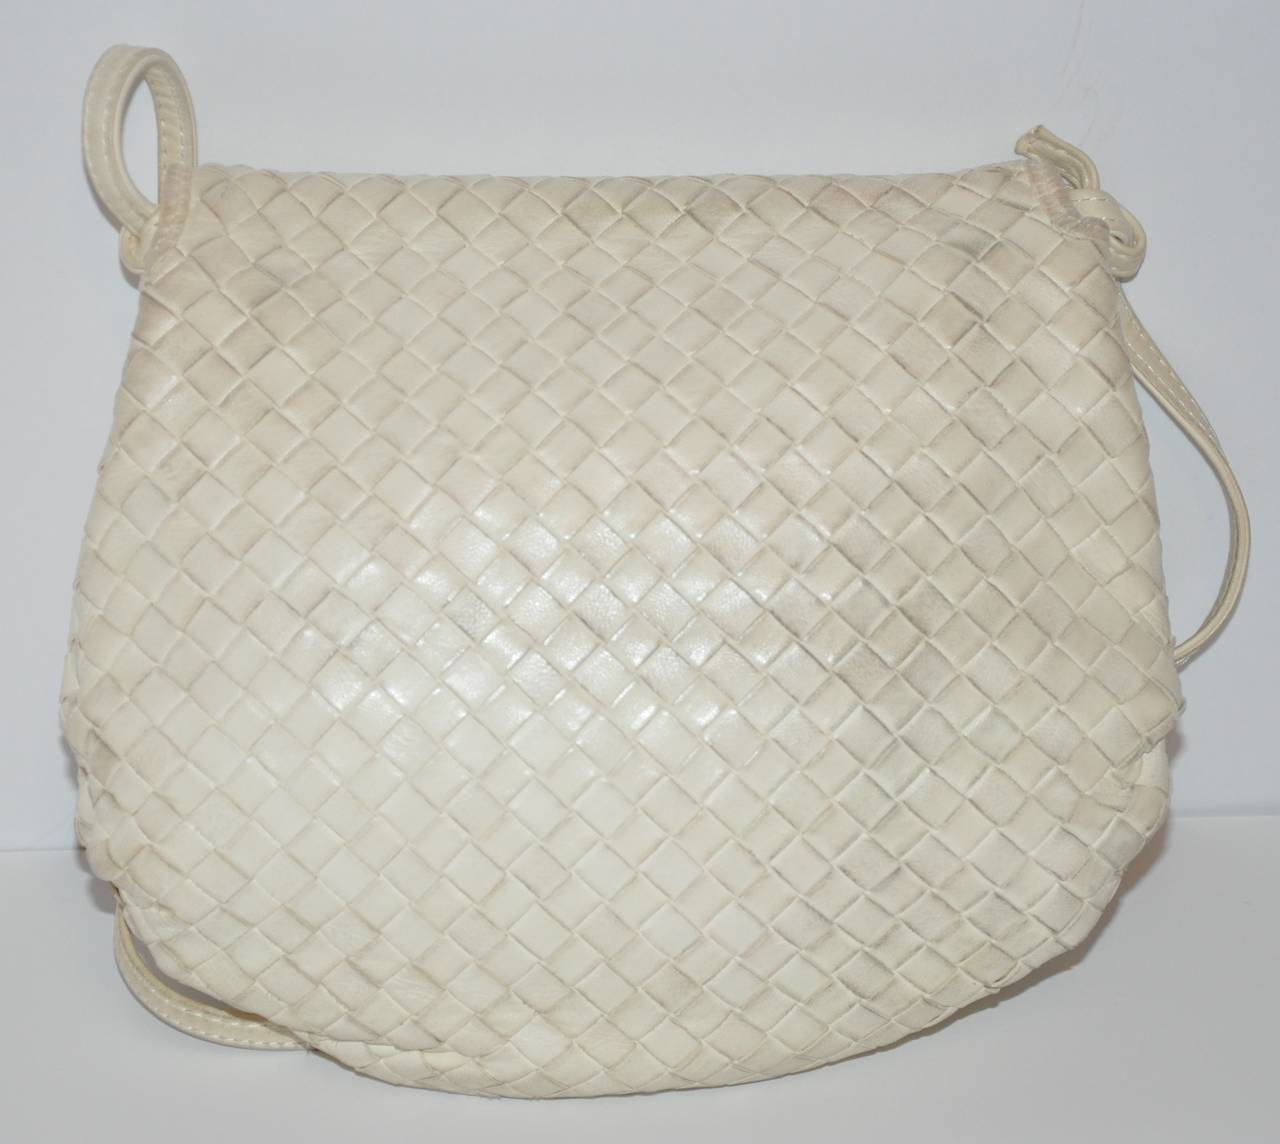 Gray Bottega Veneta Cream Signature Lambskin Woven Shoulder Bag For Sale